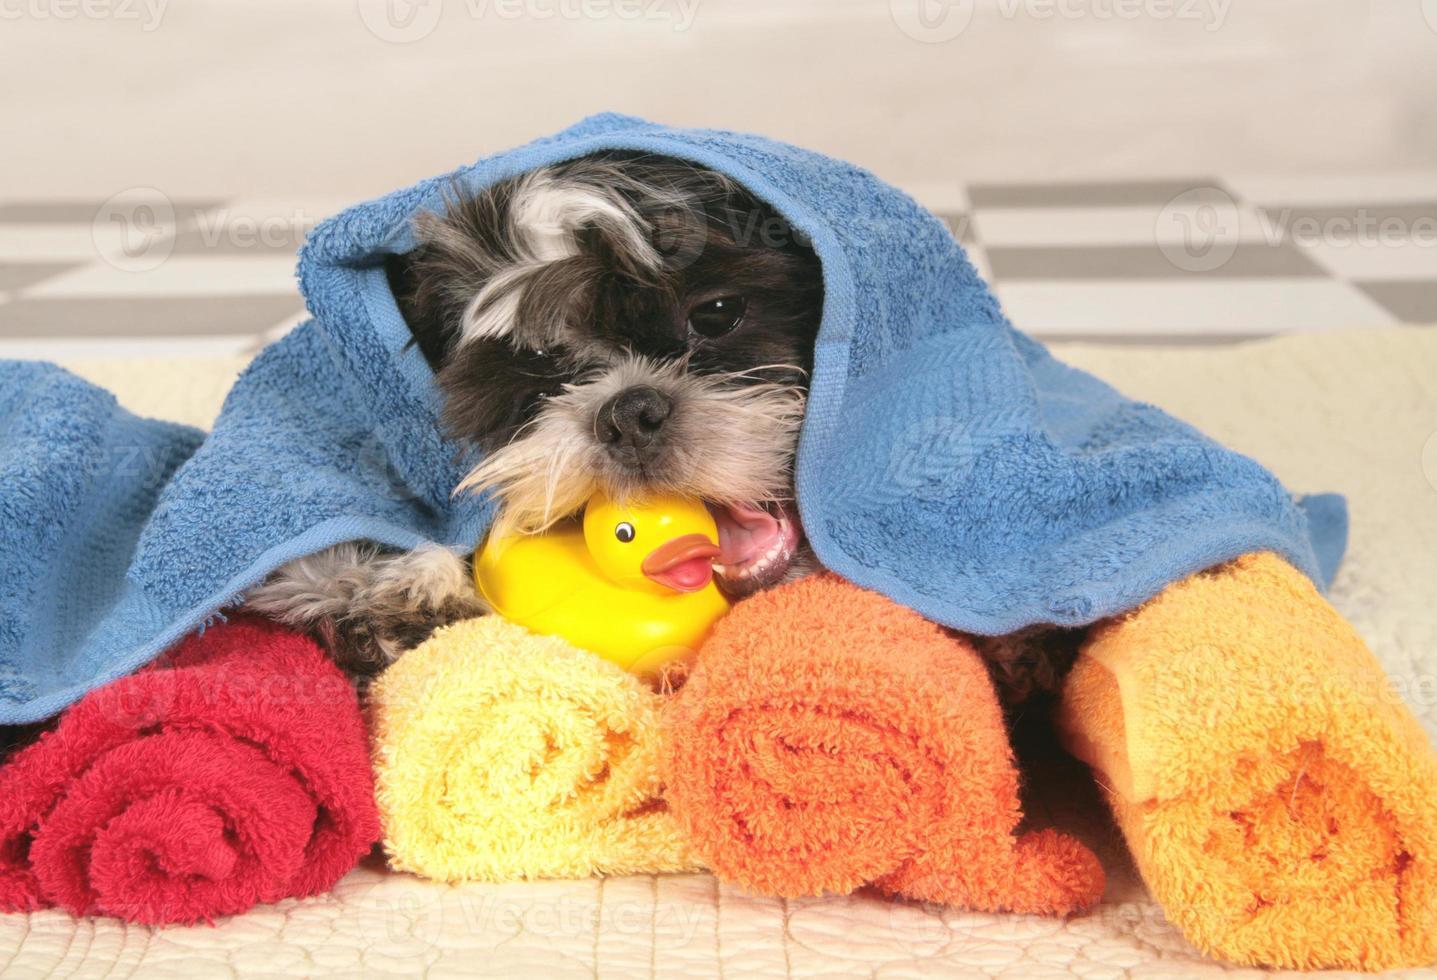 shih tzu hondenbadtijd foto